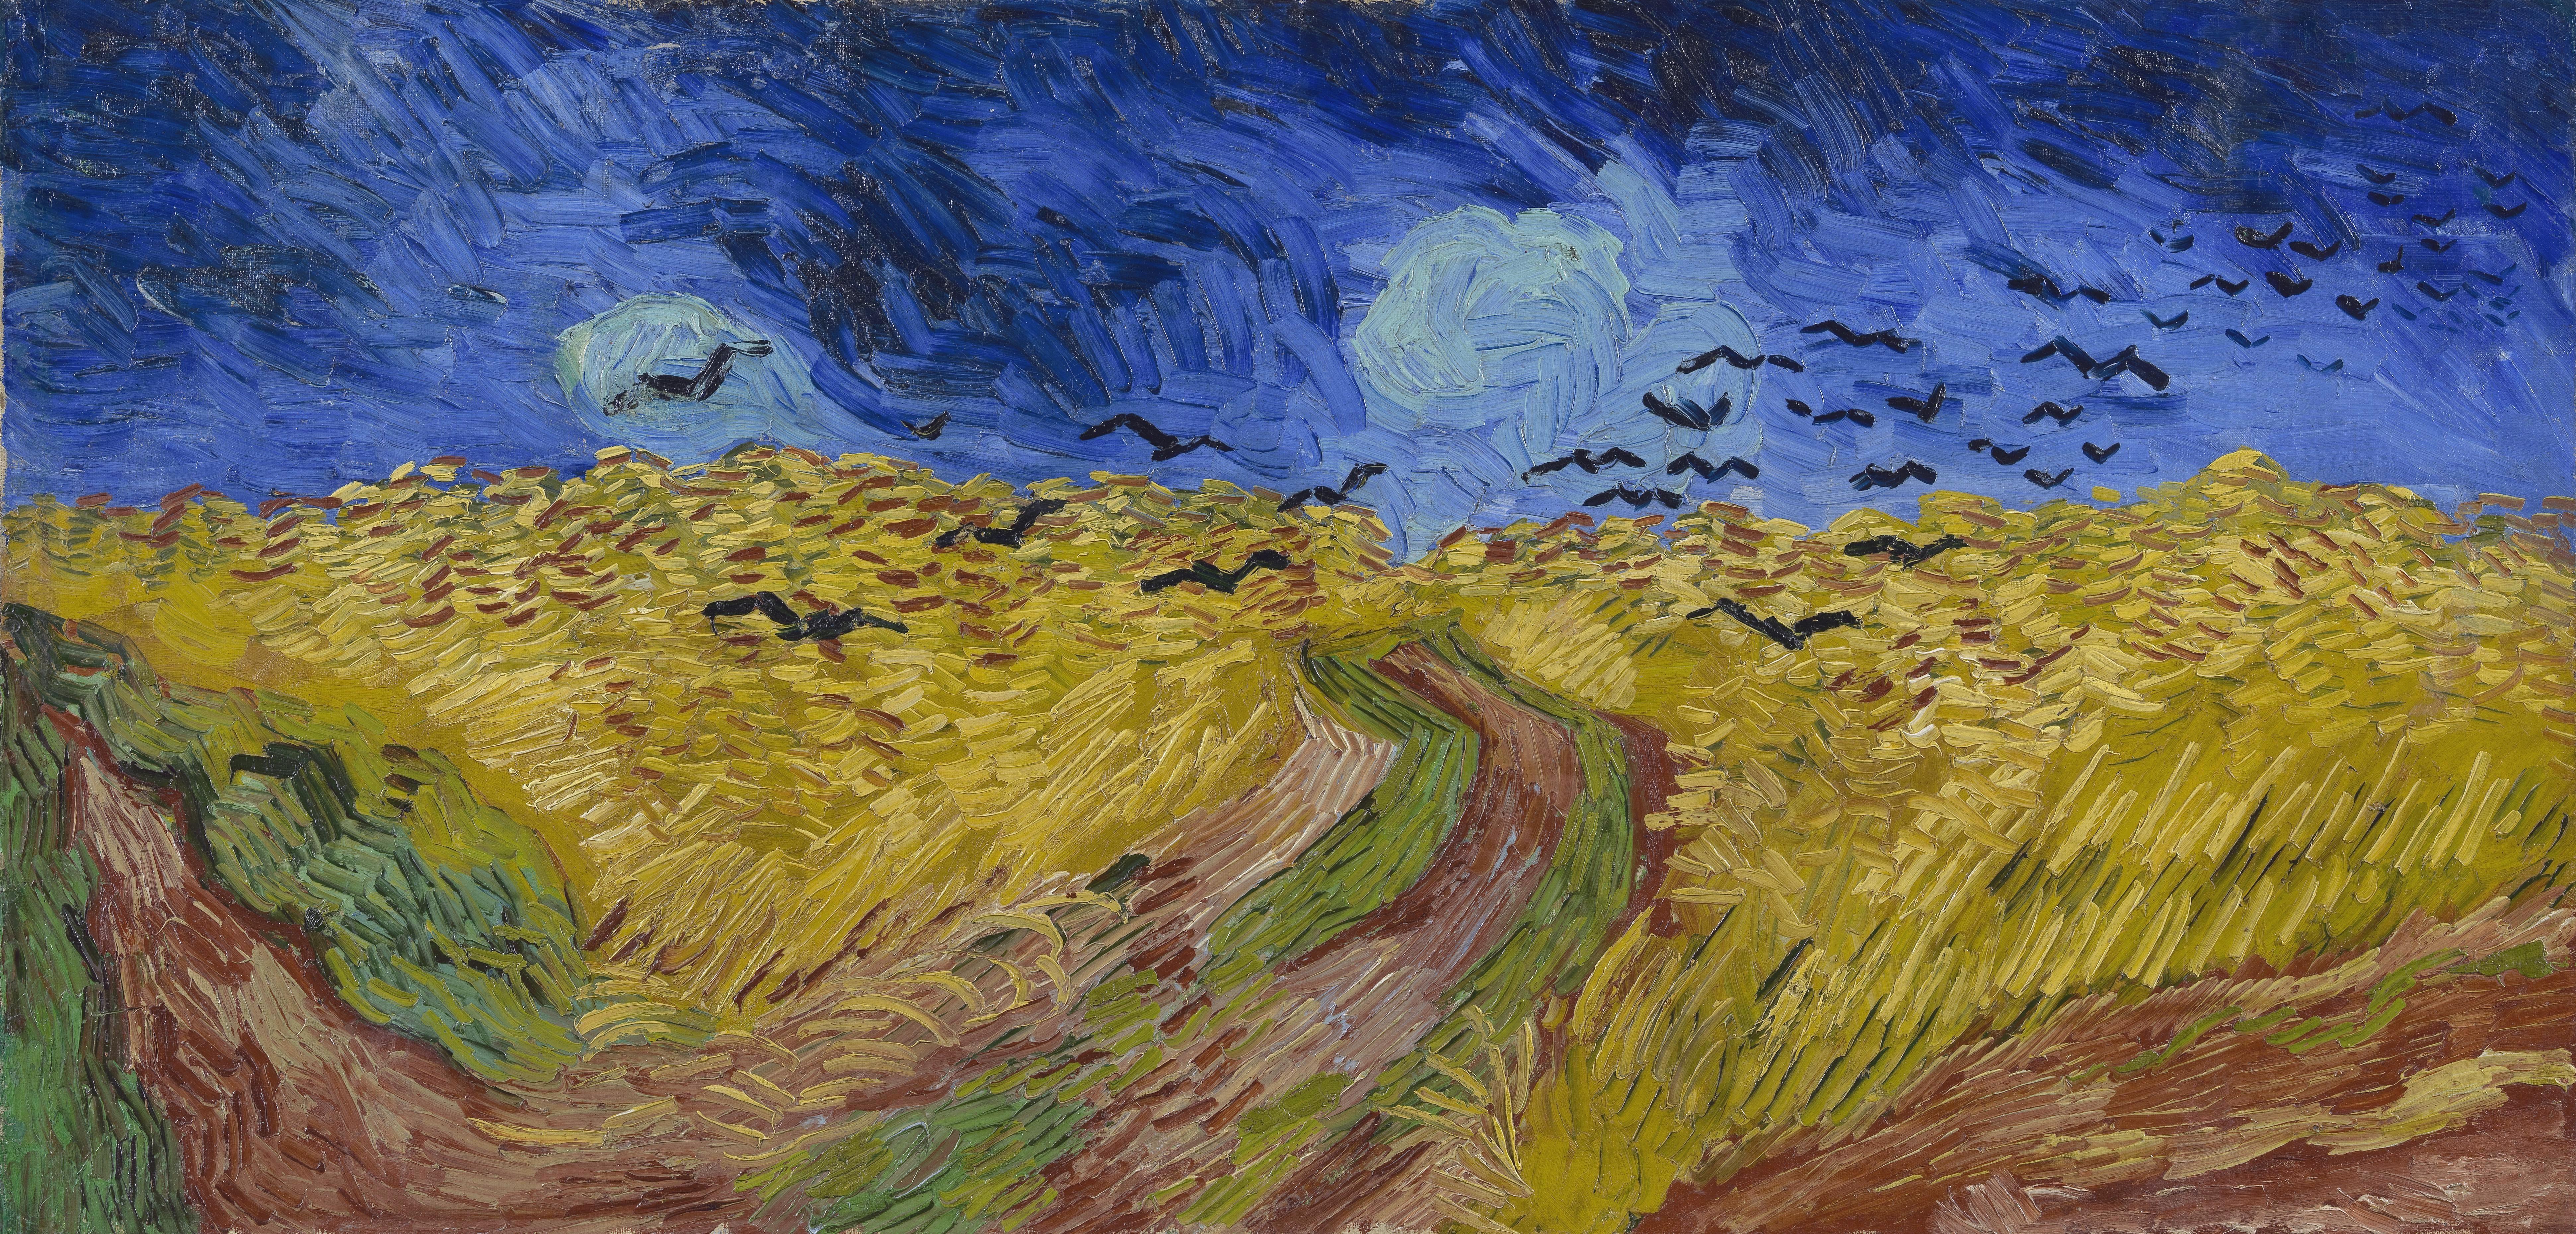 Wheatfield With Crows 1890 Van Gogh Art Vincent Van Gogh Paintings Van Gogh Paintings